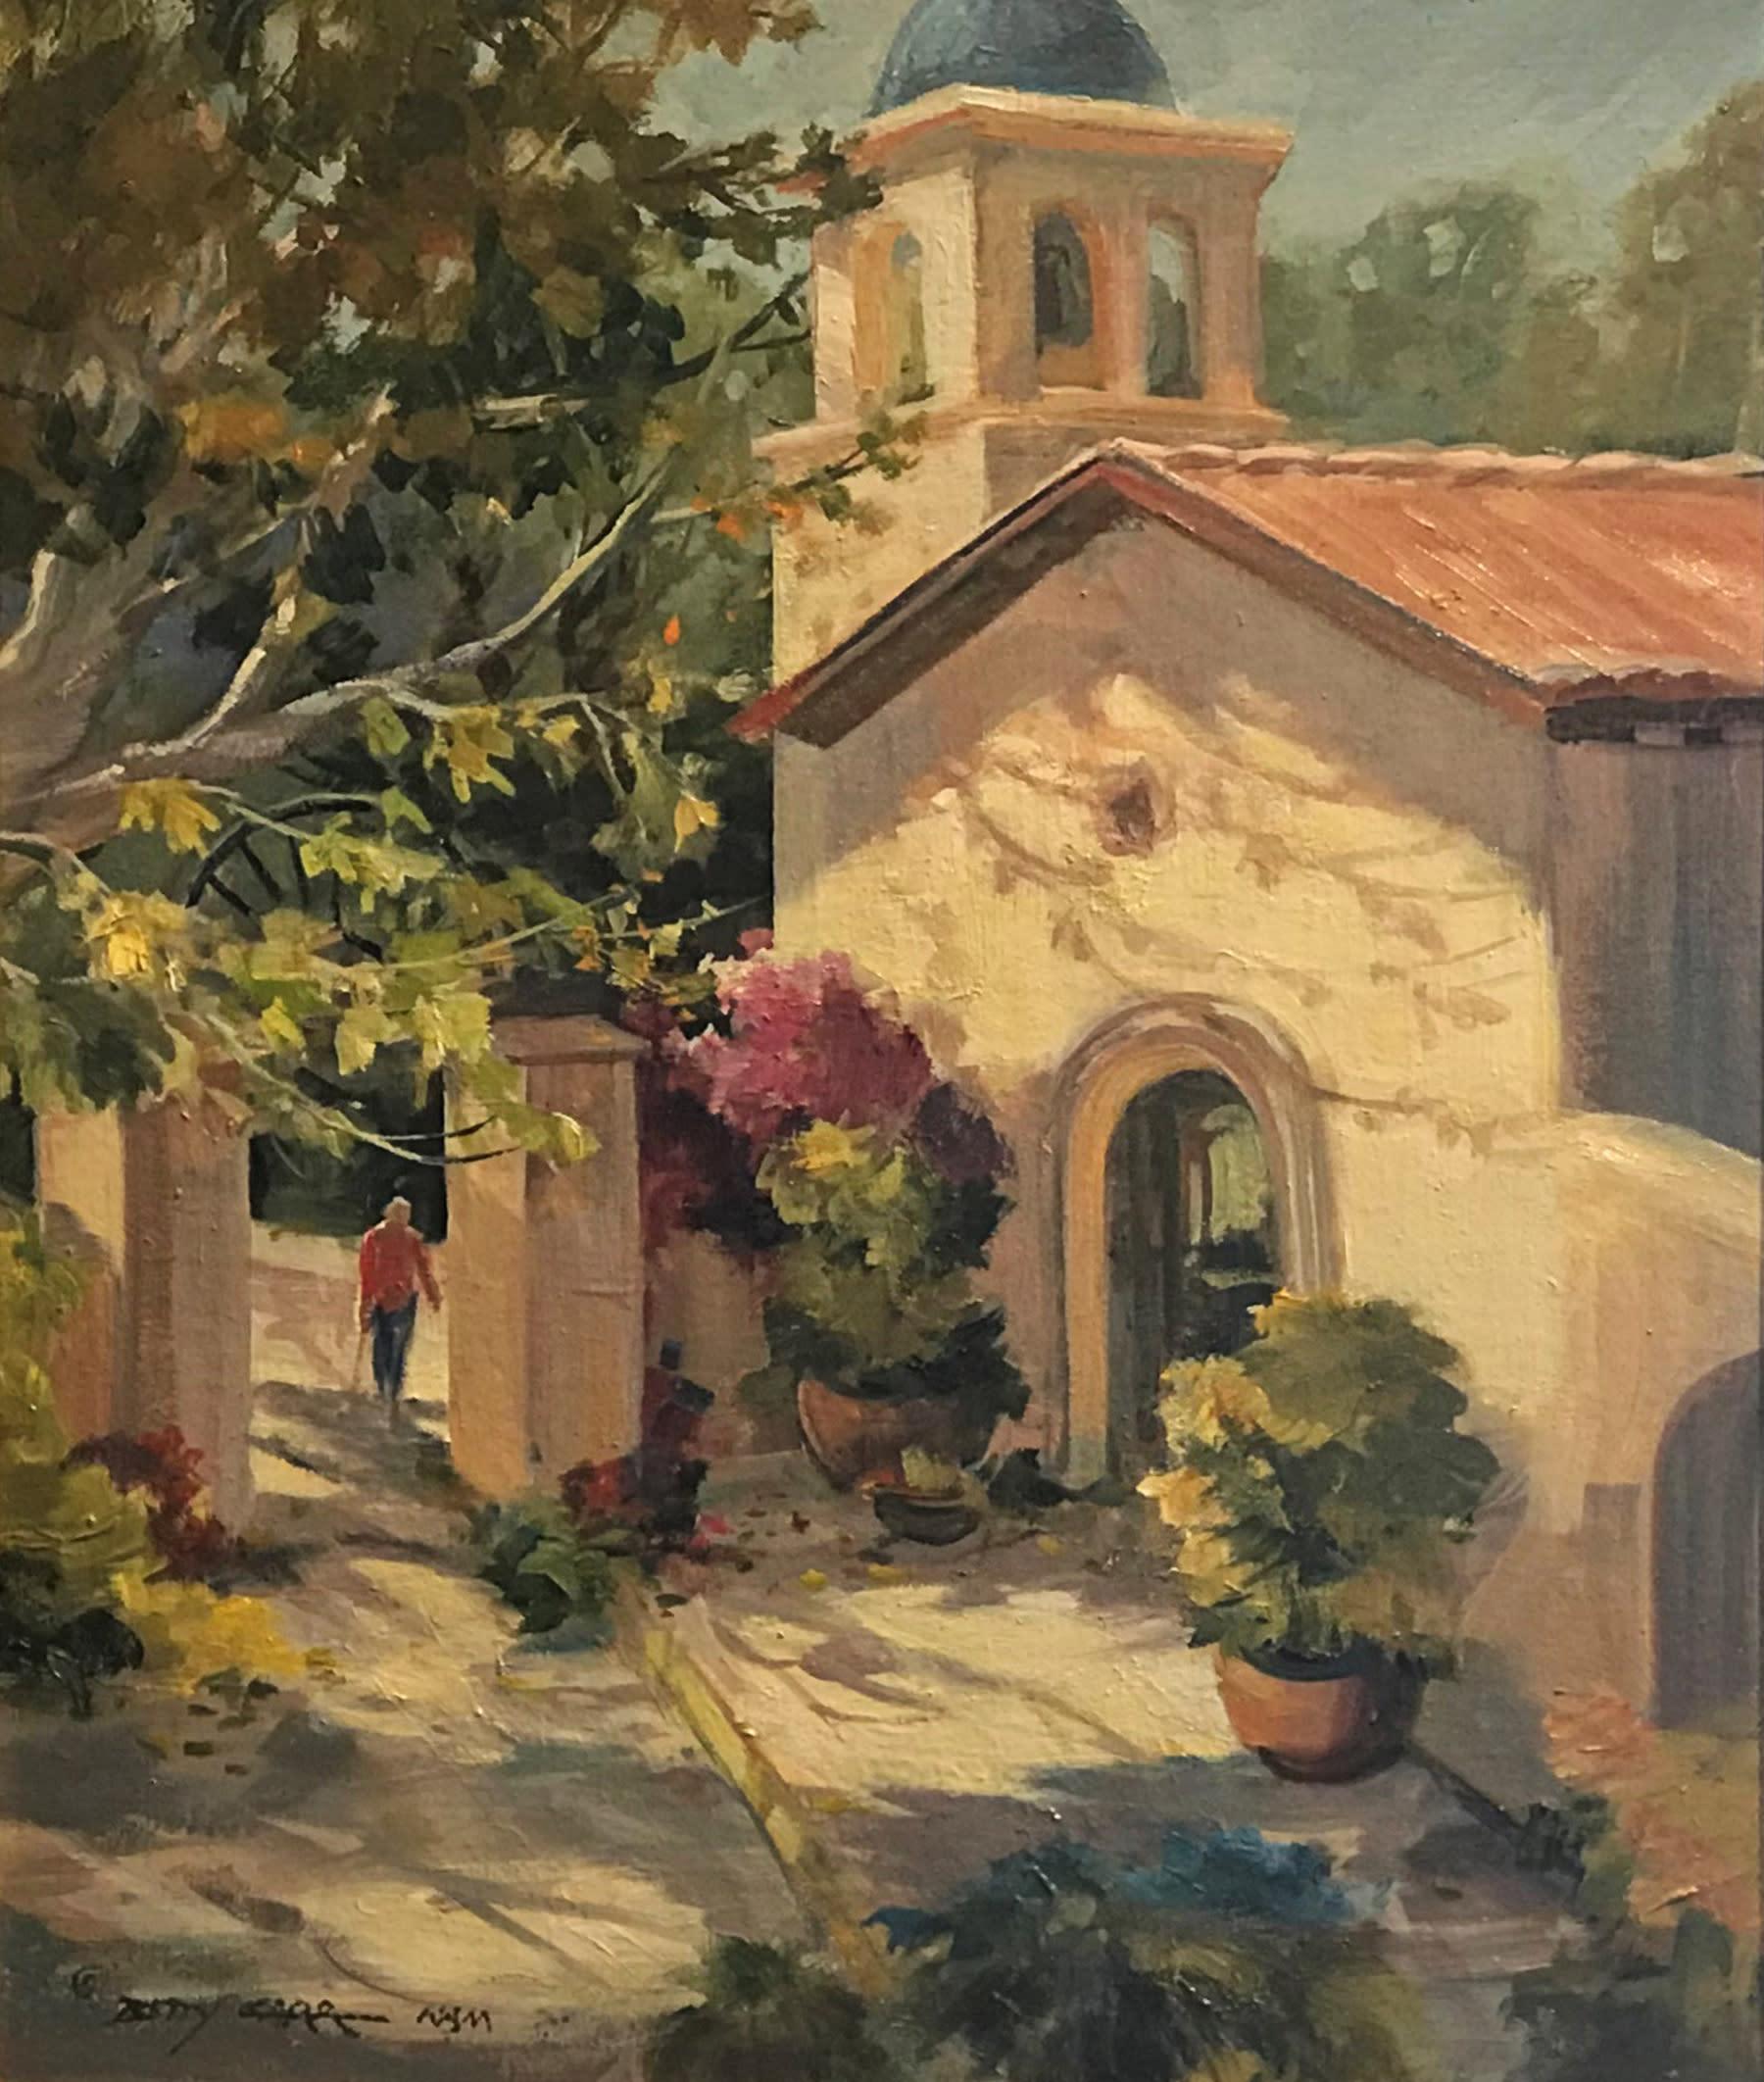 Chapel in the fall nbx2xz